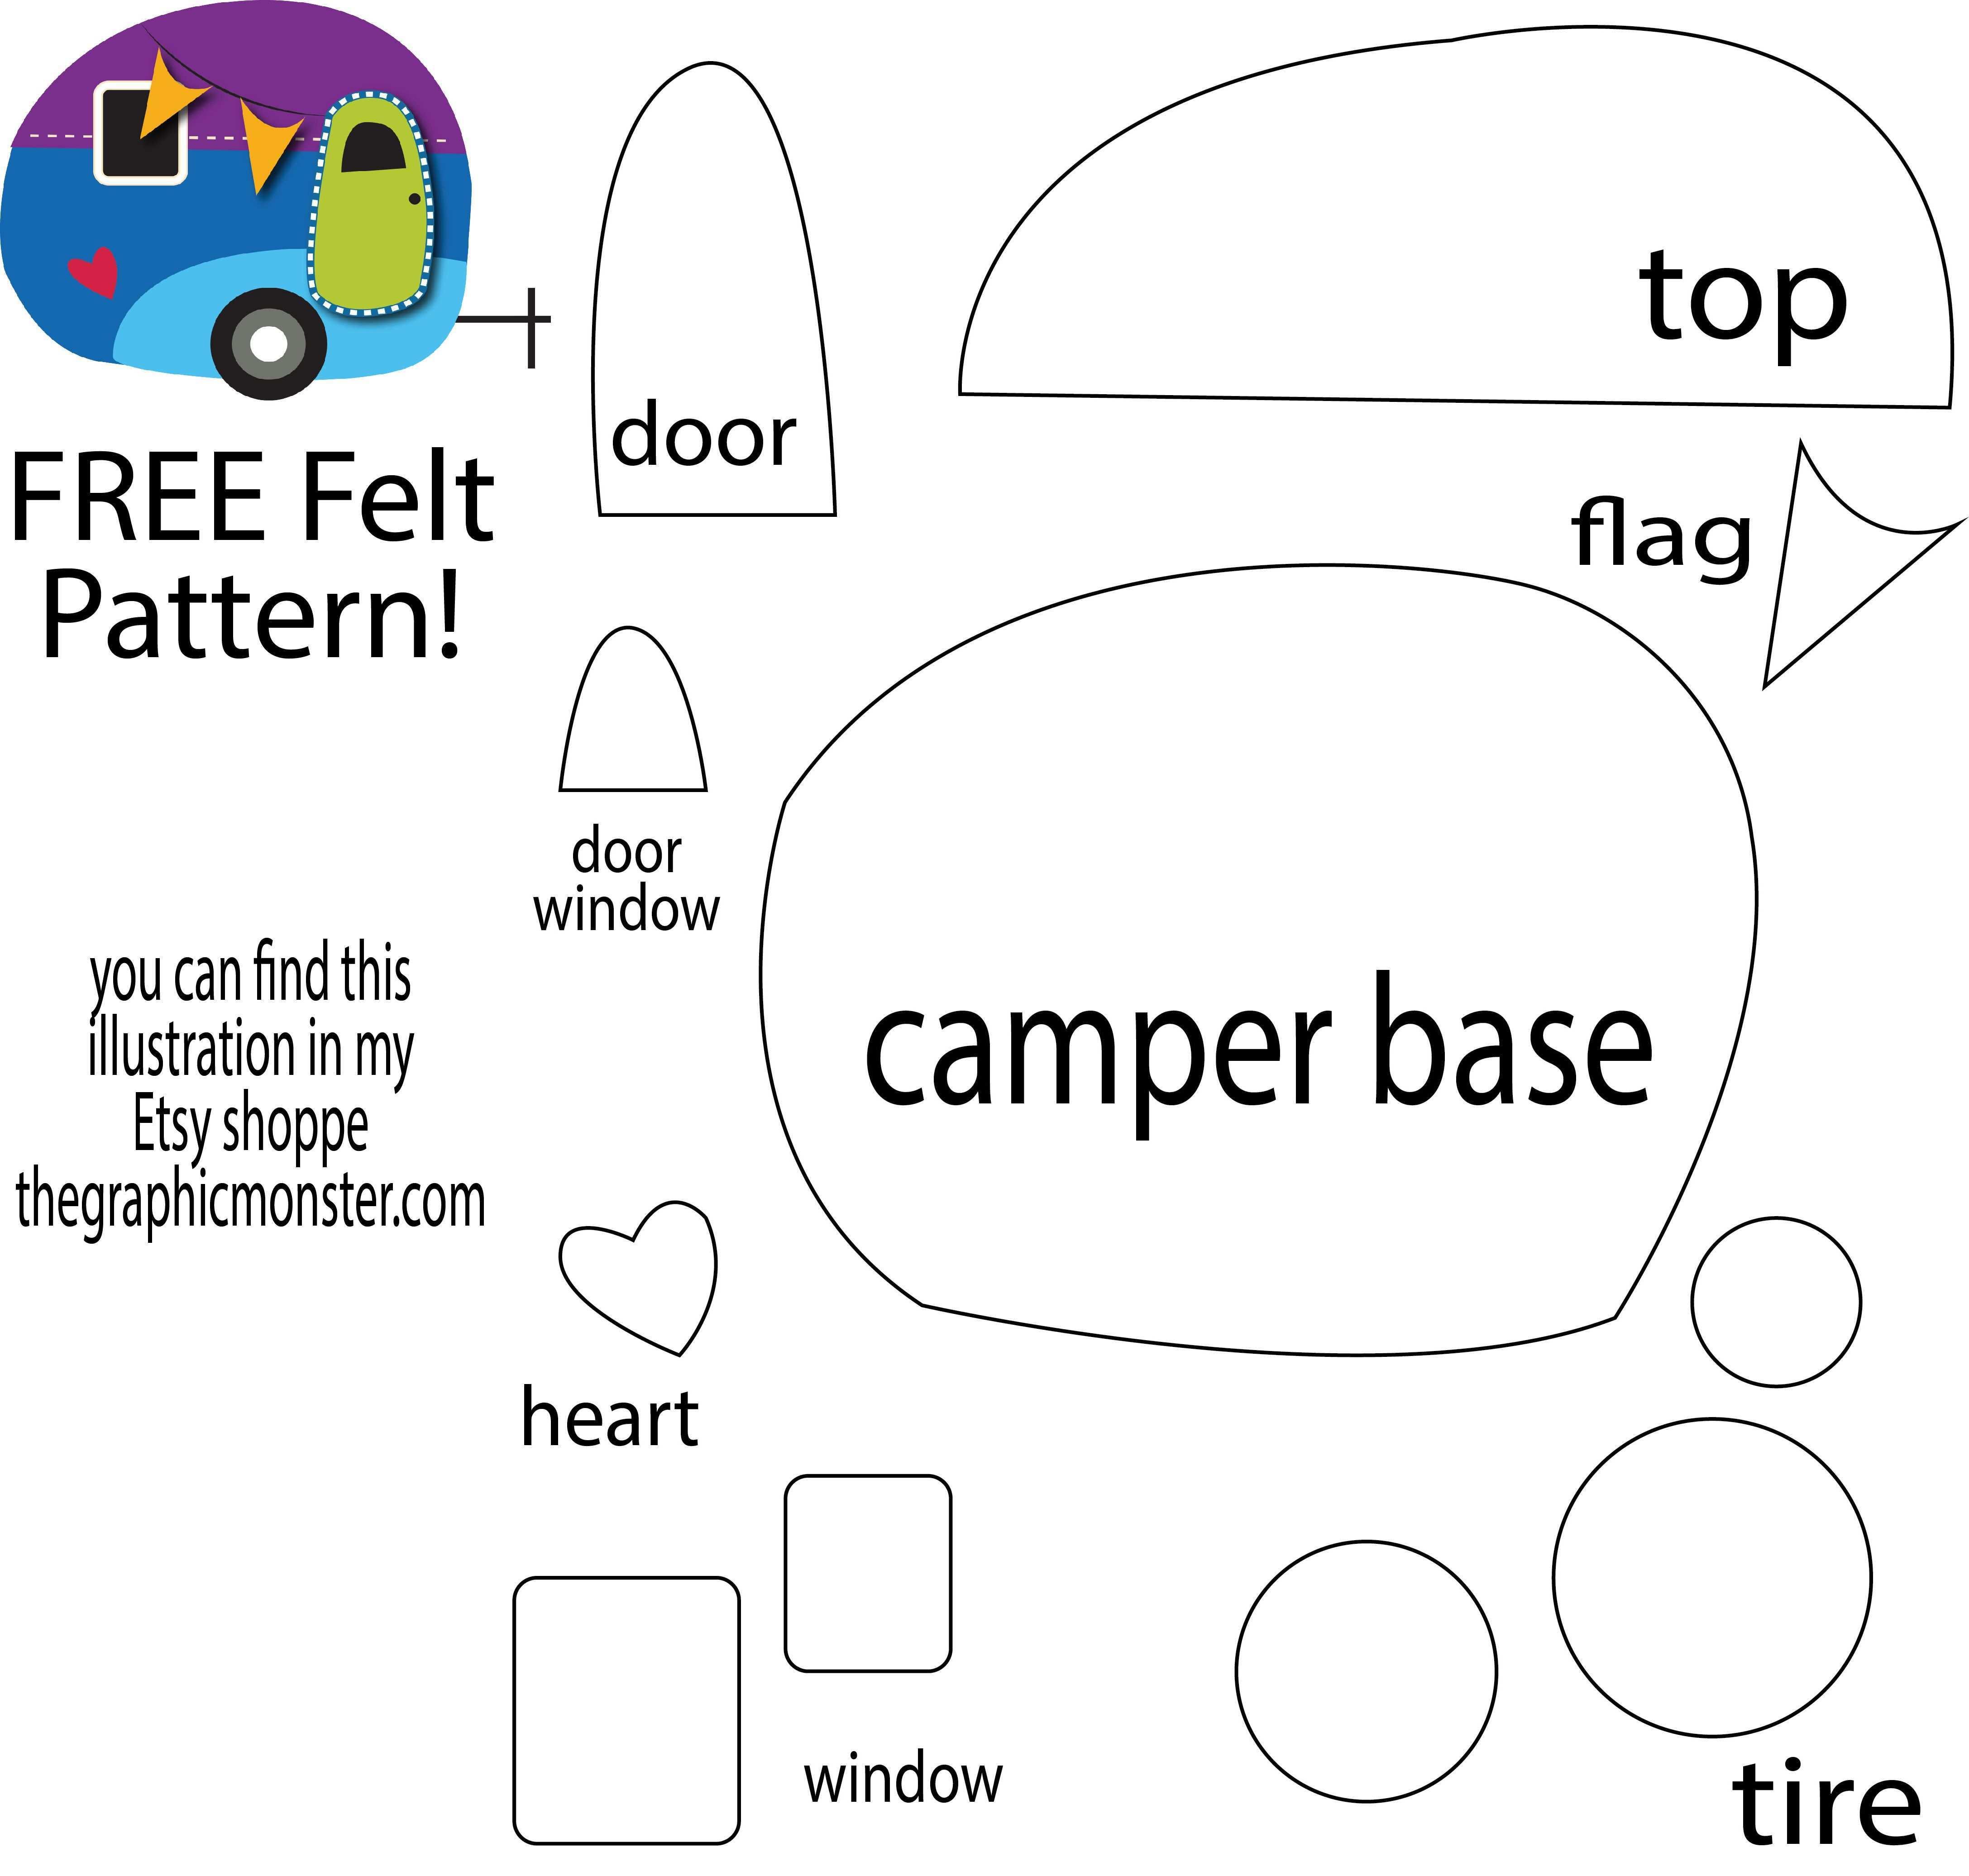 Free Felt Pattern From My Cute Camper Illustration Thegraphicmonster Com Filzmuster Filz Hangeschmuck Weihnachtliche Filzideen